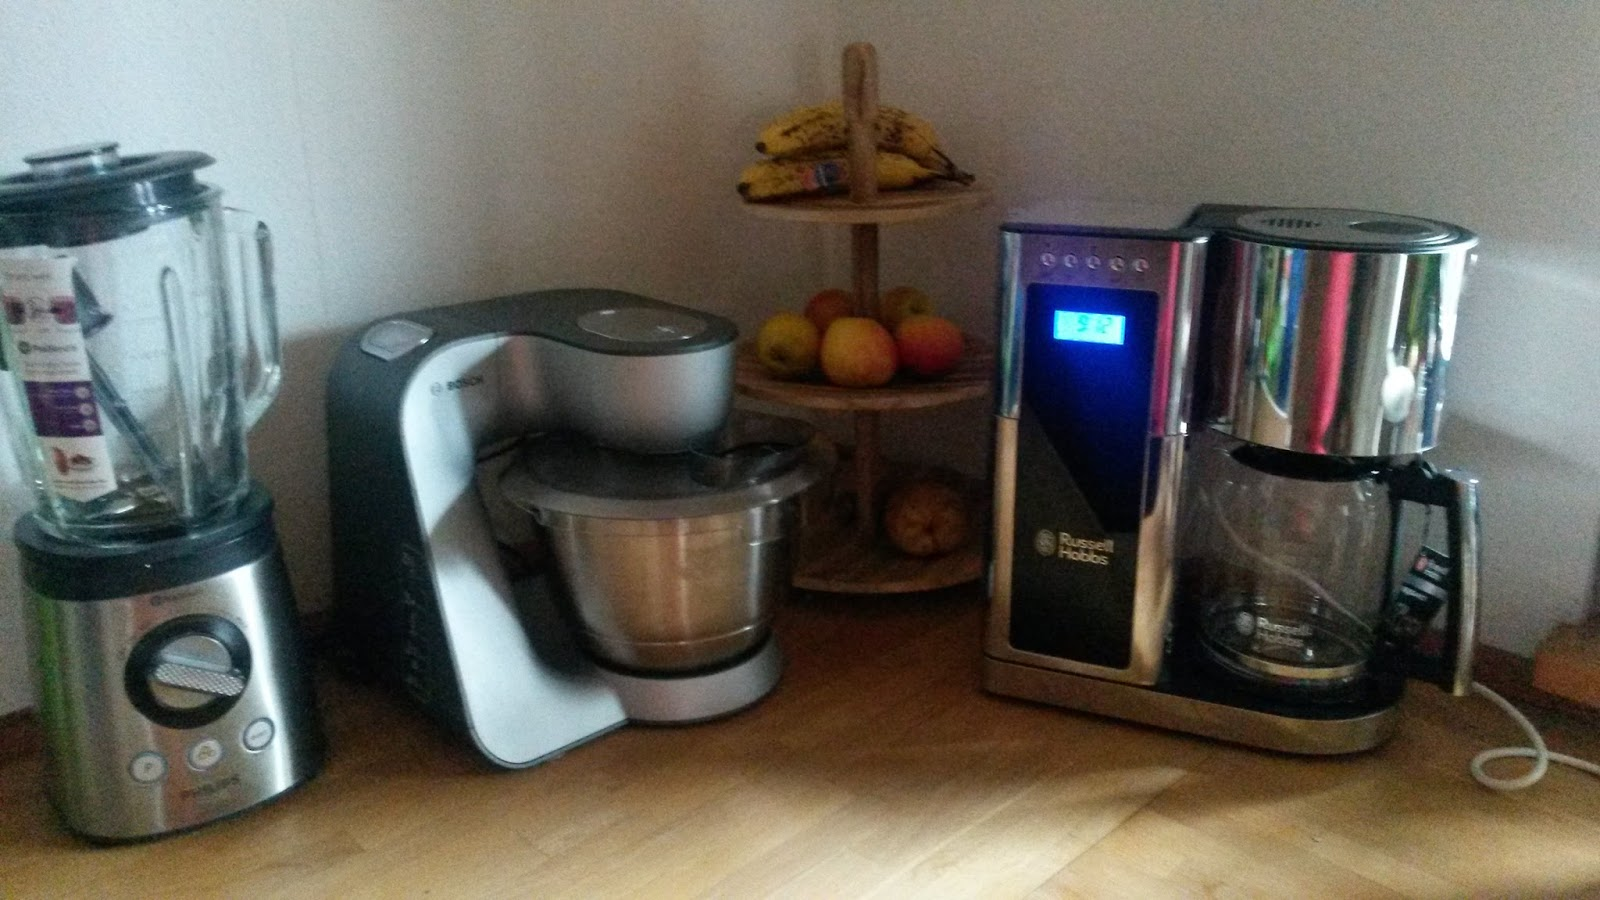 caliko produkttests und mehr russell hobbs kaffeemaschine. Black Bedroom Furniture Sets. Home Design Ideas